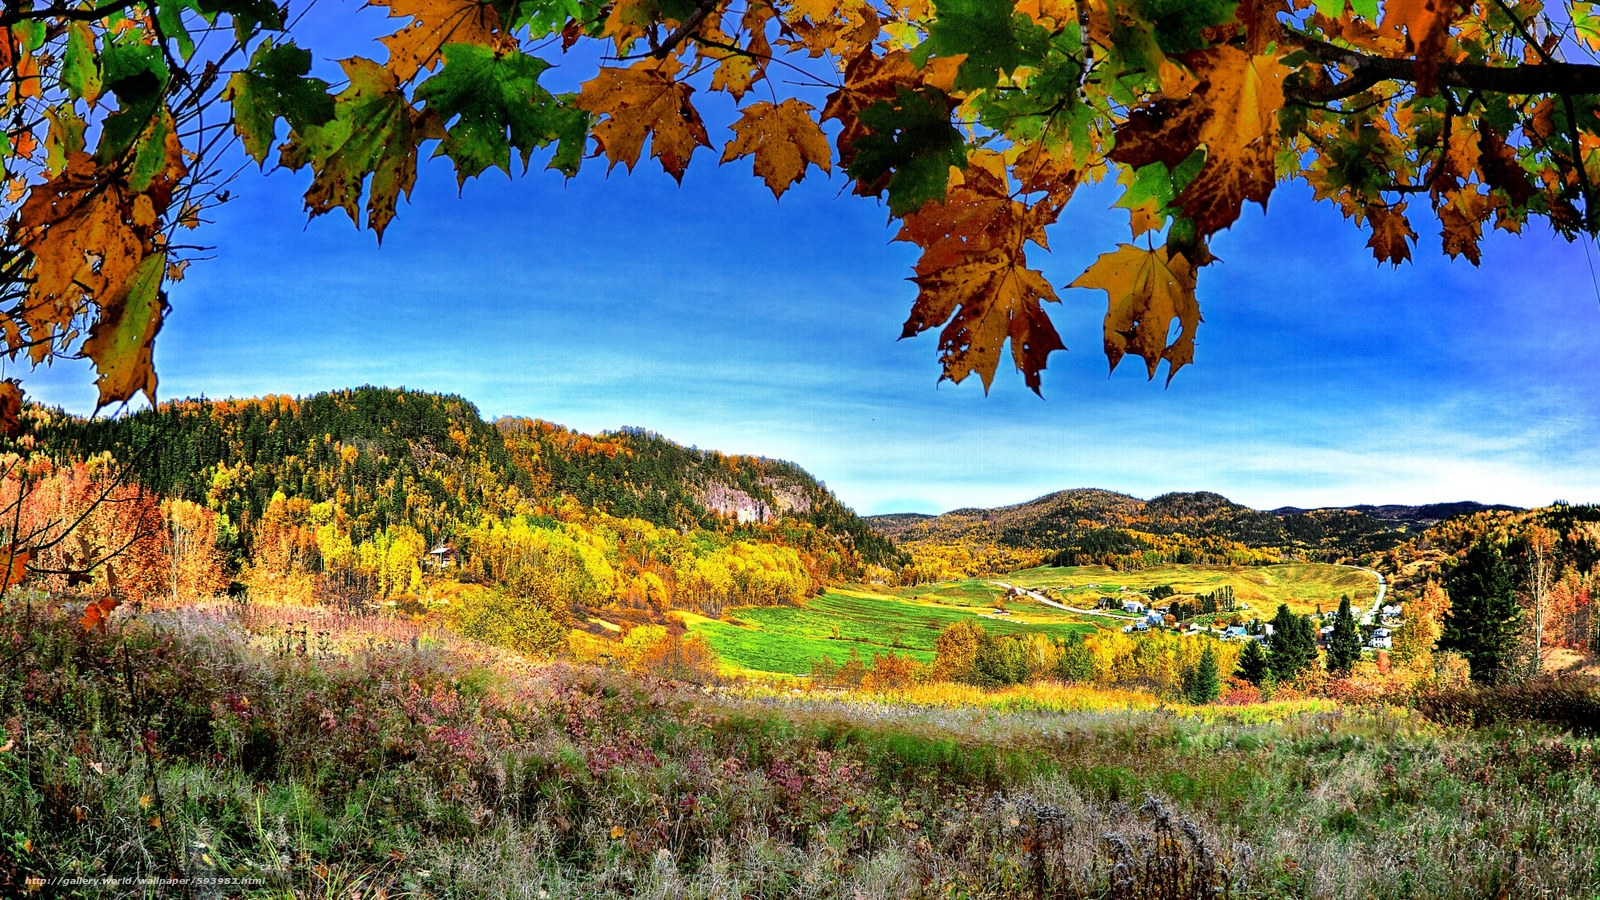 Tlcharger fond d 39 ecran automne montagnes hills arbres for Sfondi autunno hd